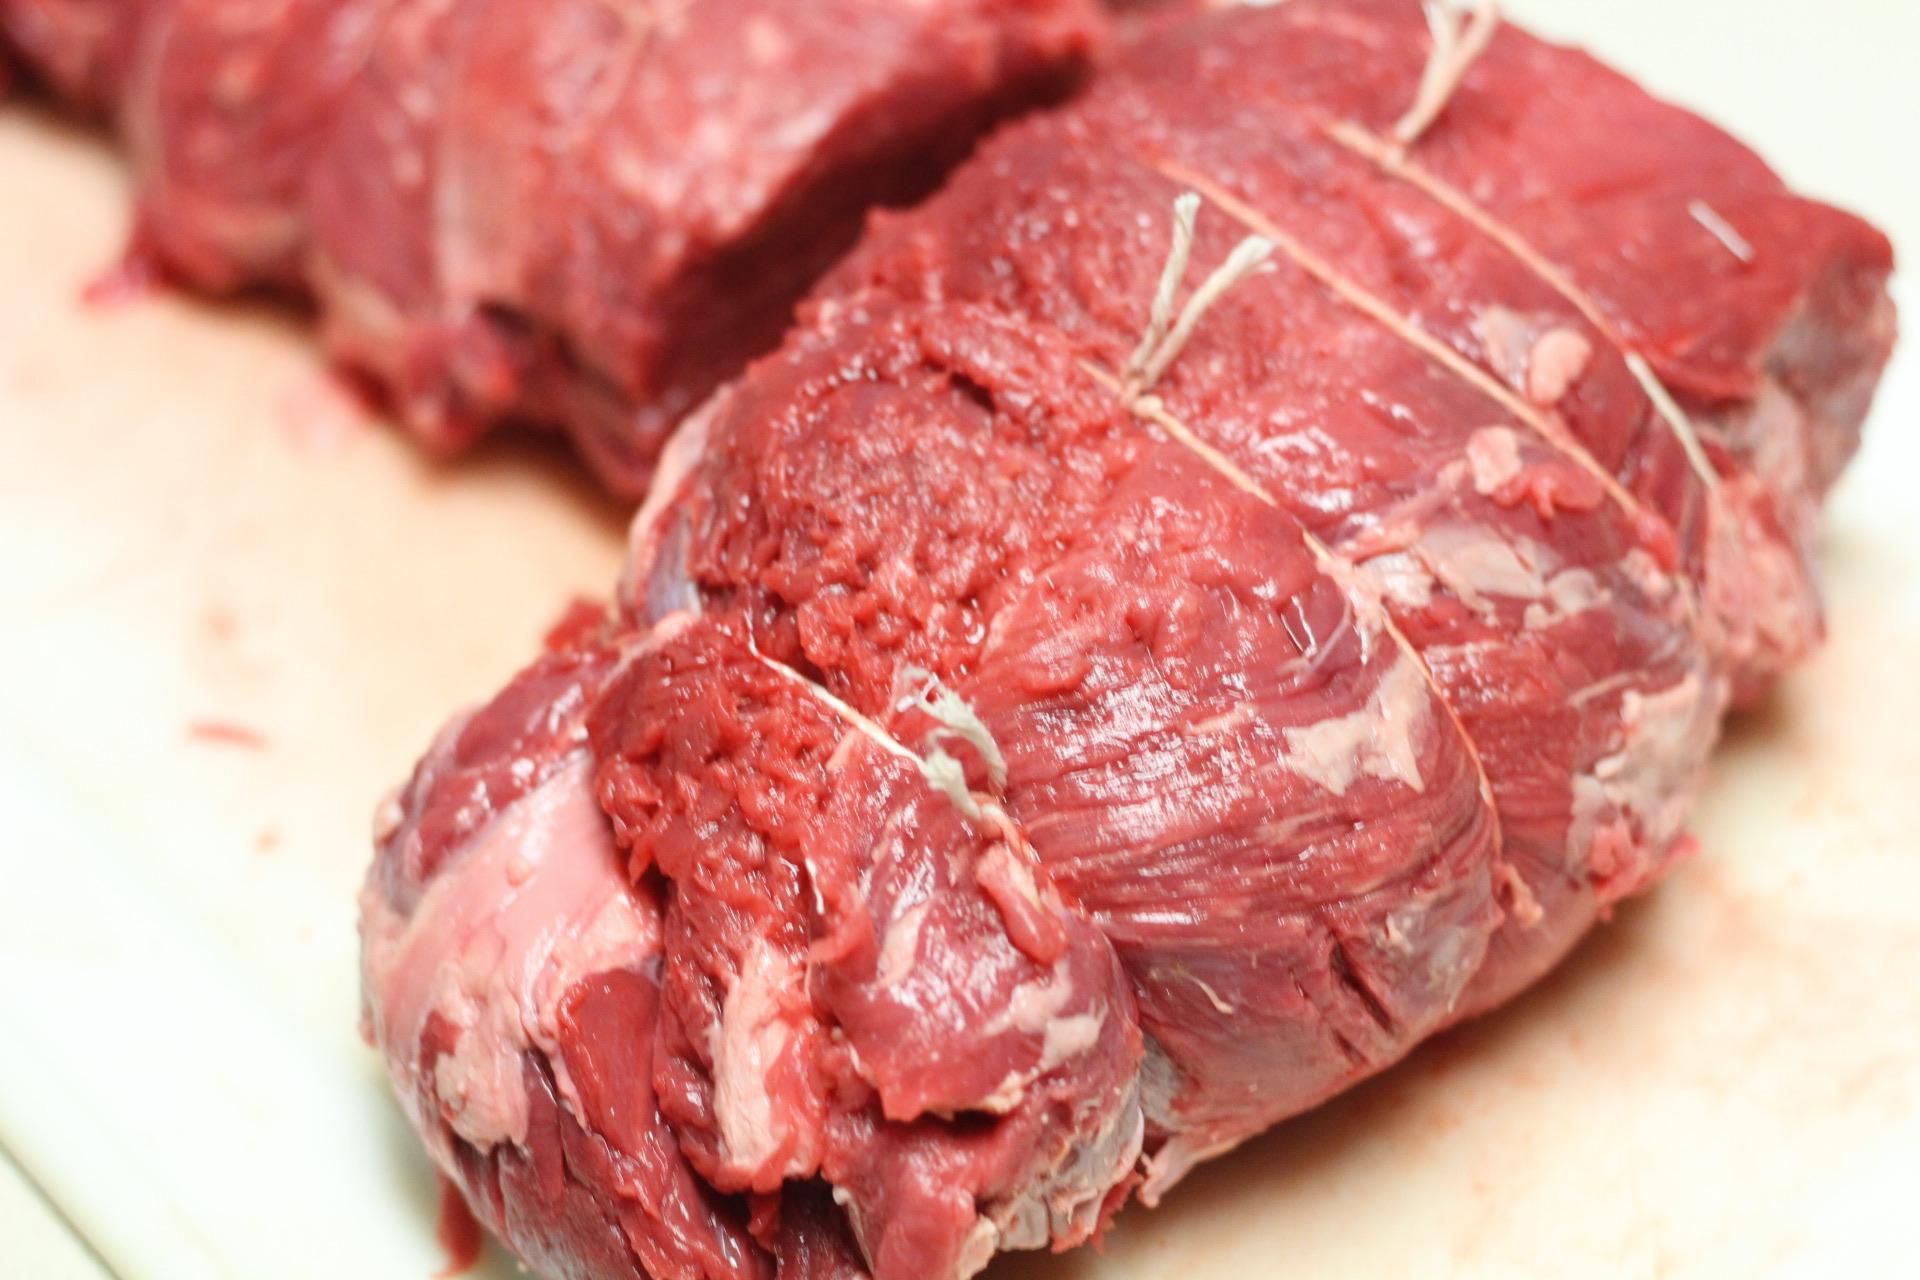 Steak half